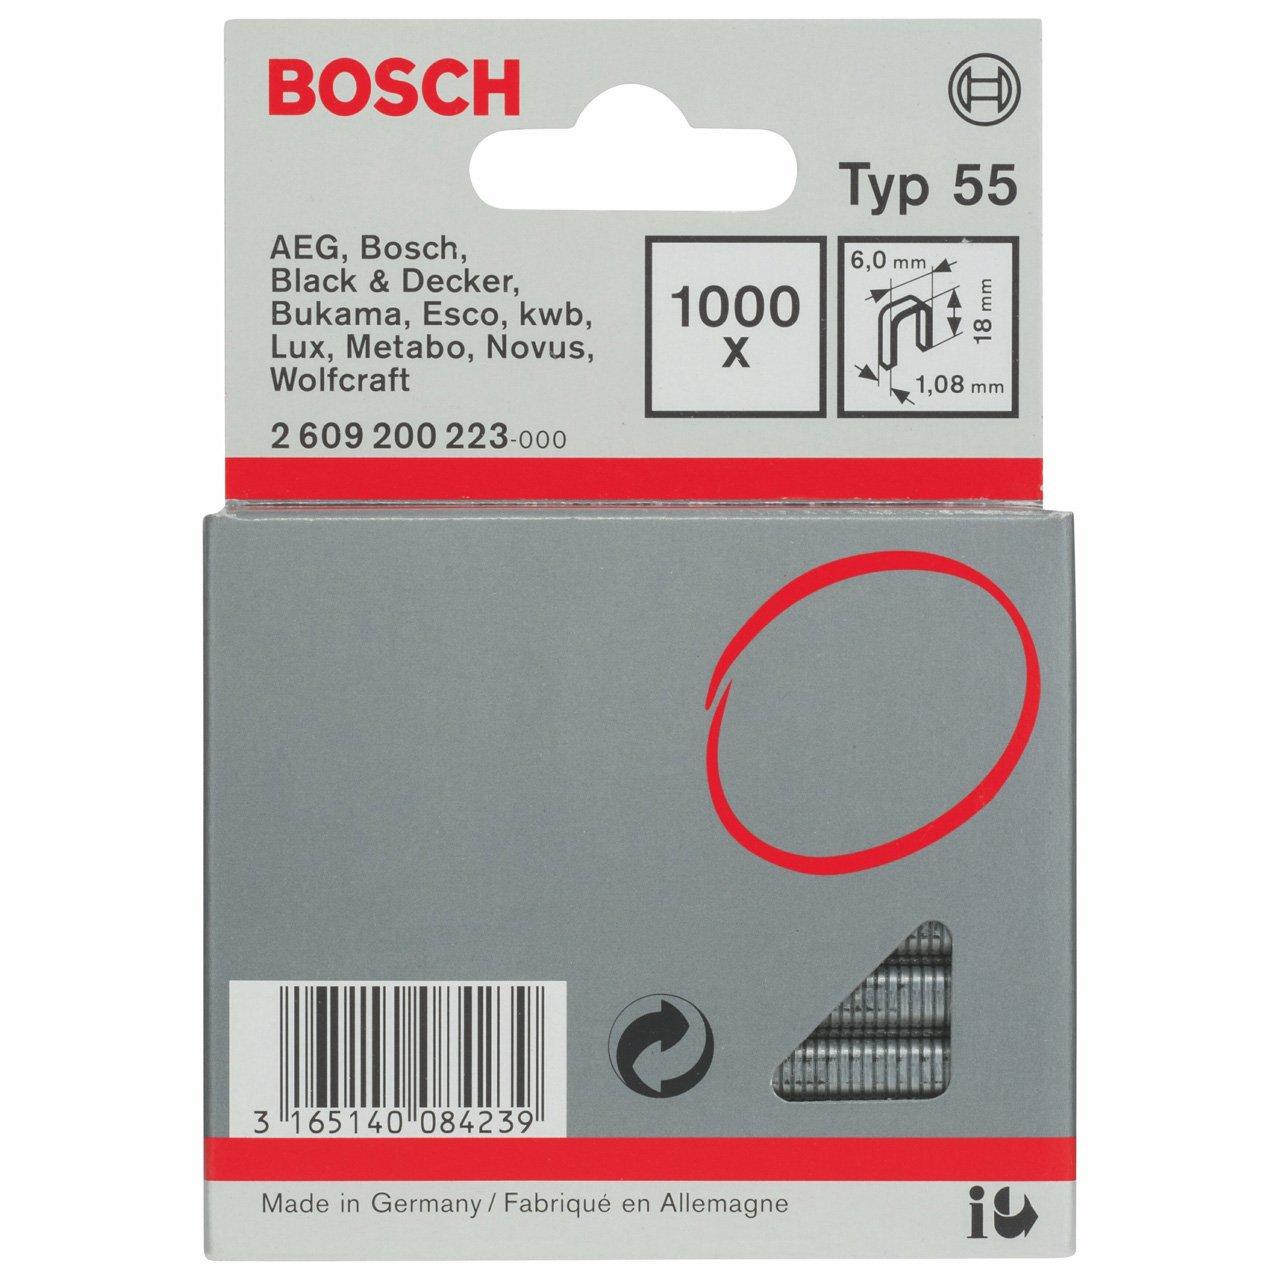 Bosch 2609200223 Fine Wire Staple 18x6mm 1000 Pcs